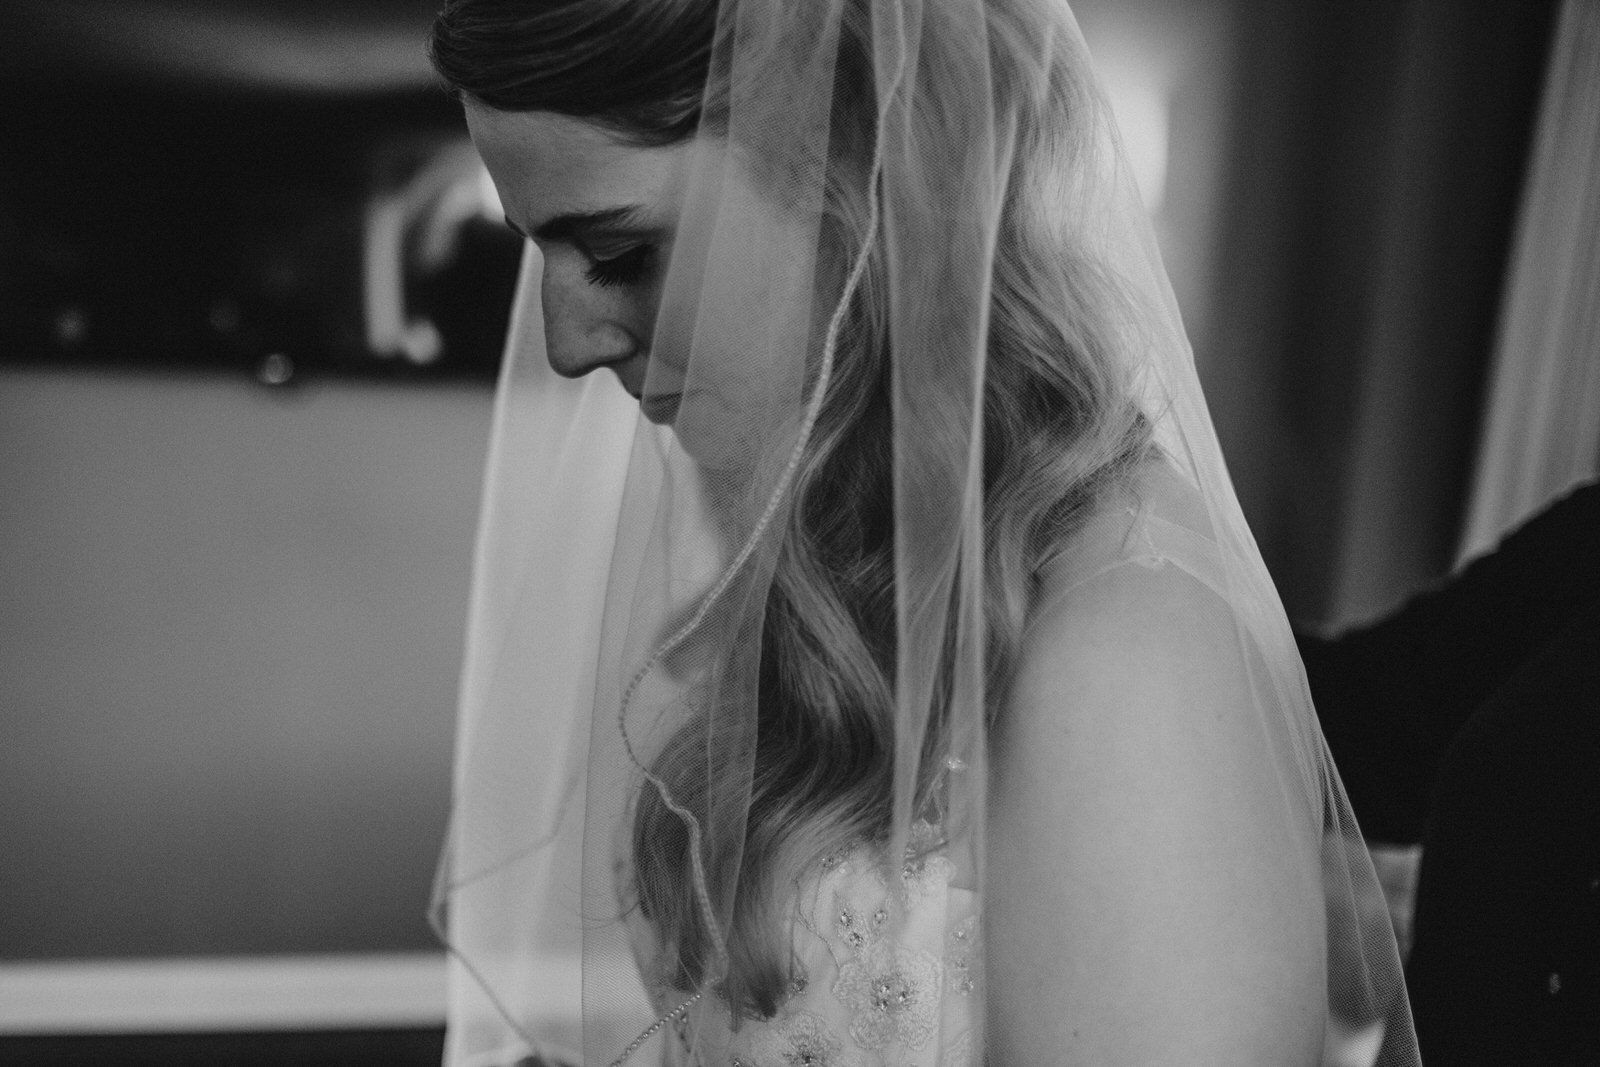 Oxford_Mississippi_wedding_photographer_13.JPG